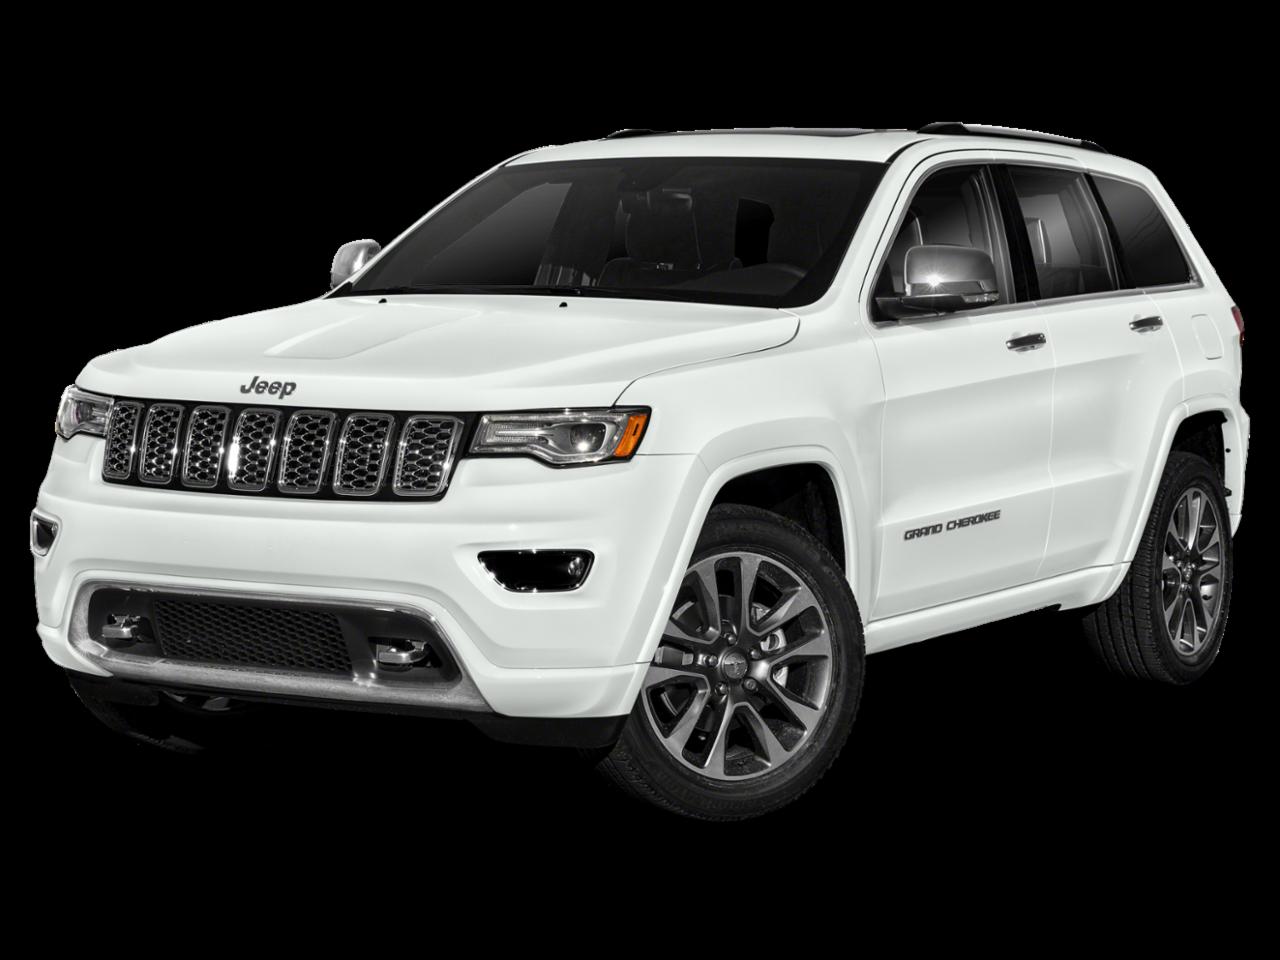 Jeep 2020 Grand Cherokee Overland